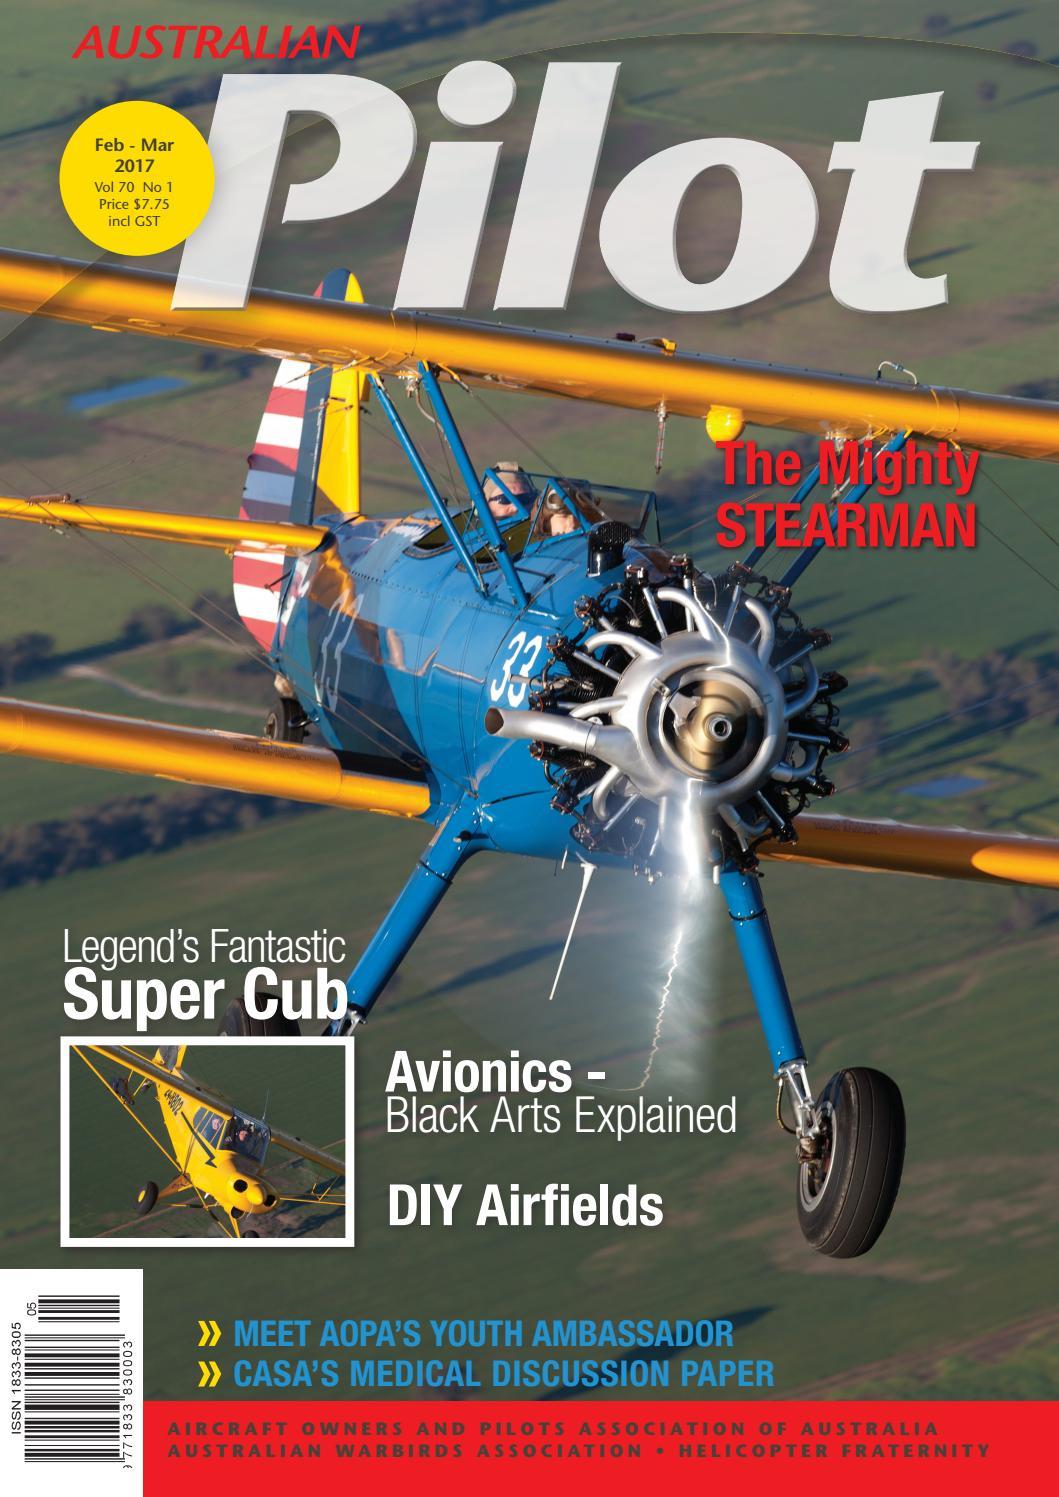 Australian PILOT Magazine Feb-Mar 2017 by AOPA Australia - issuu